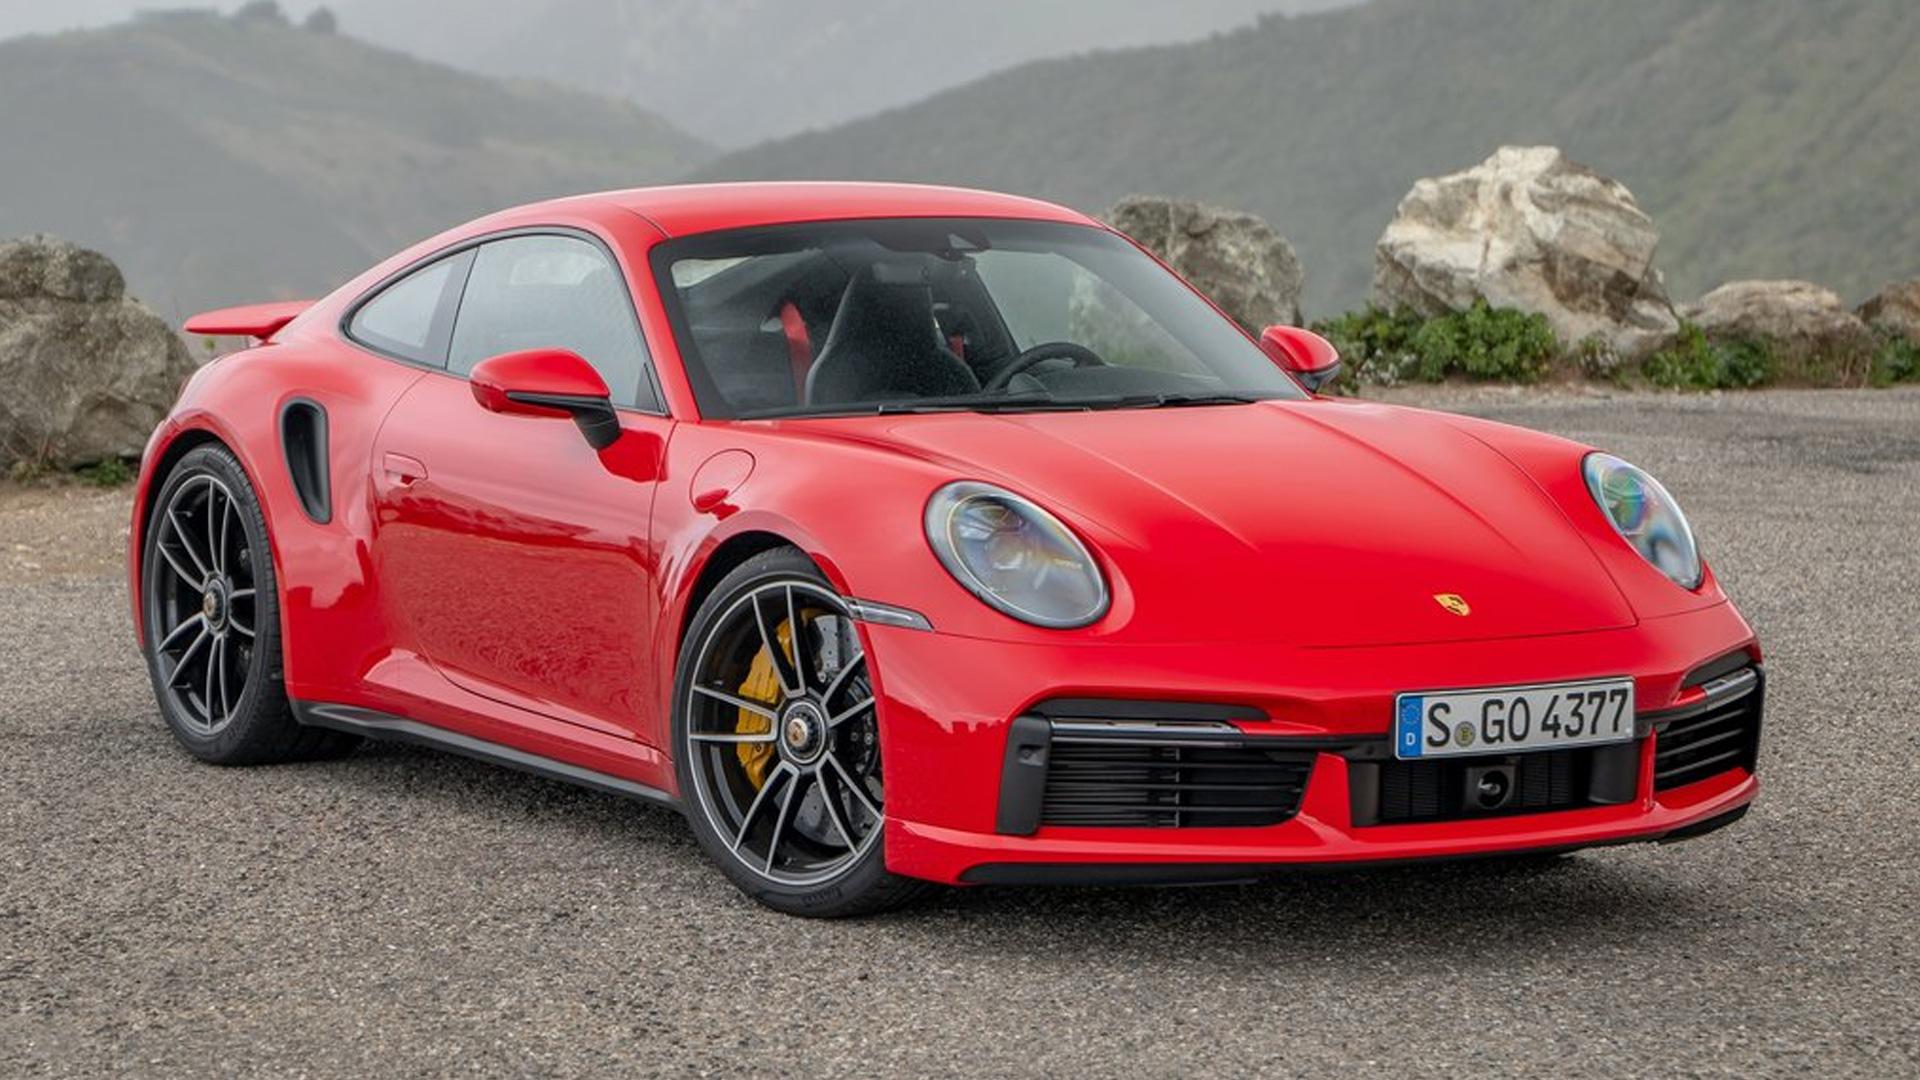 Porsche 911 Turbo 2016 S